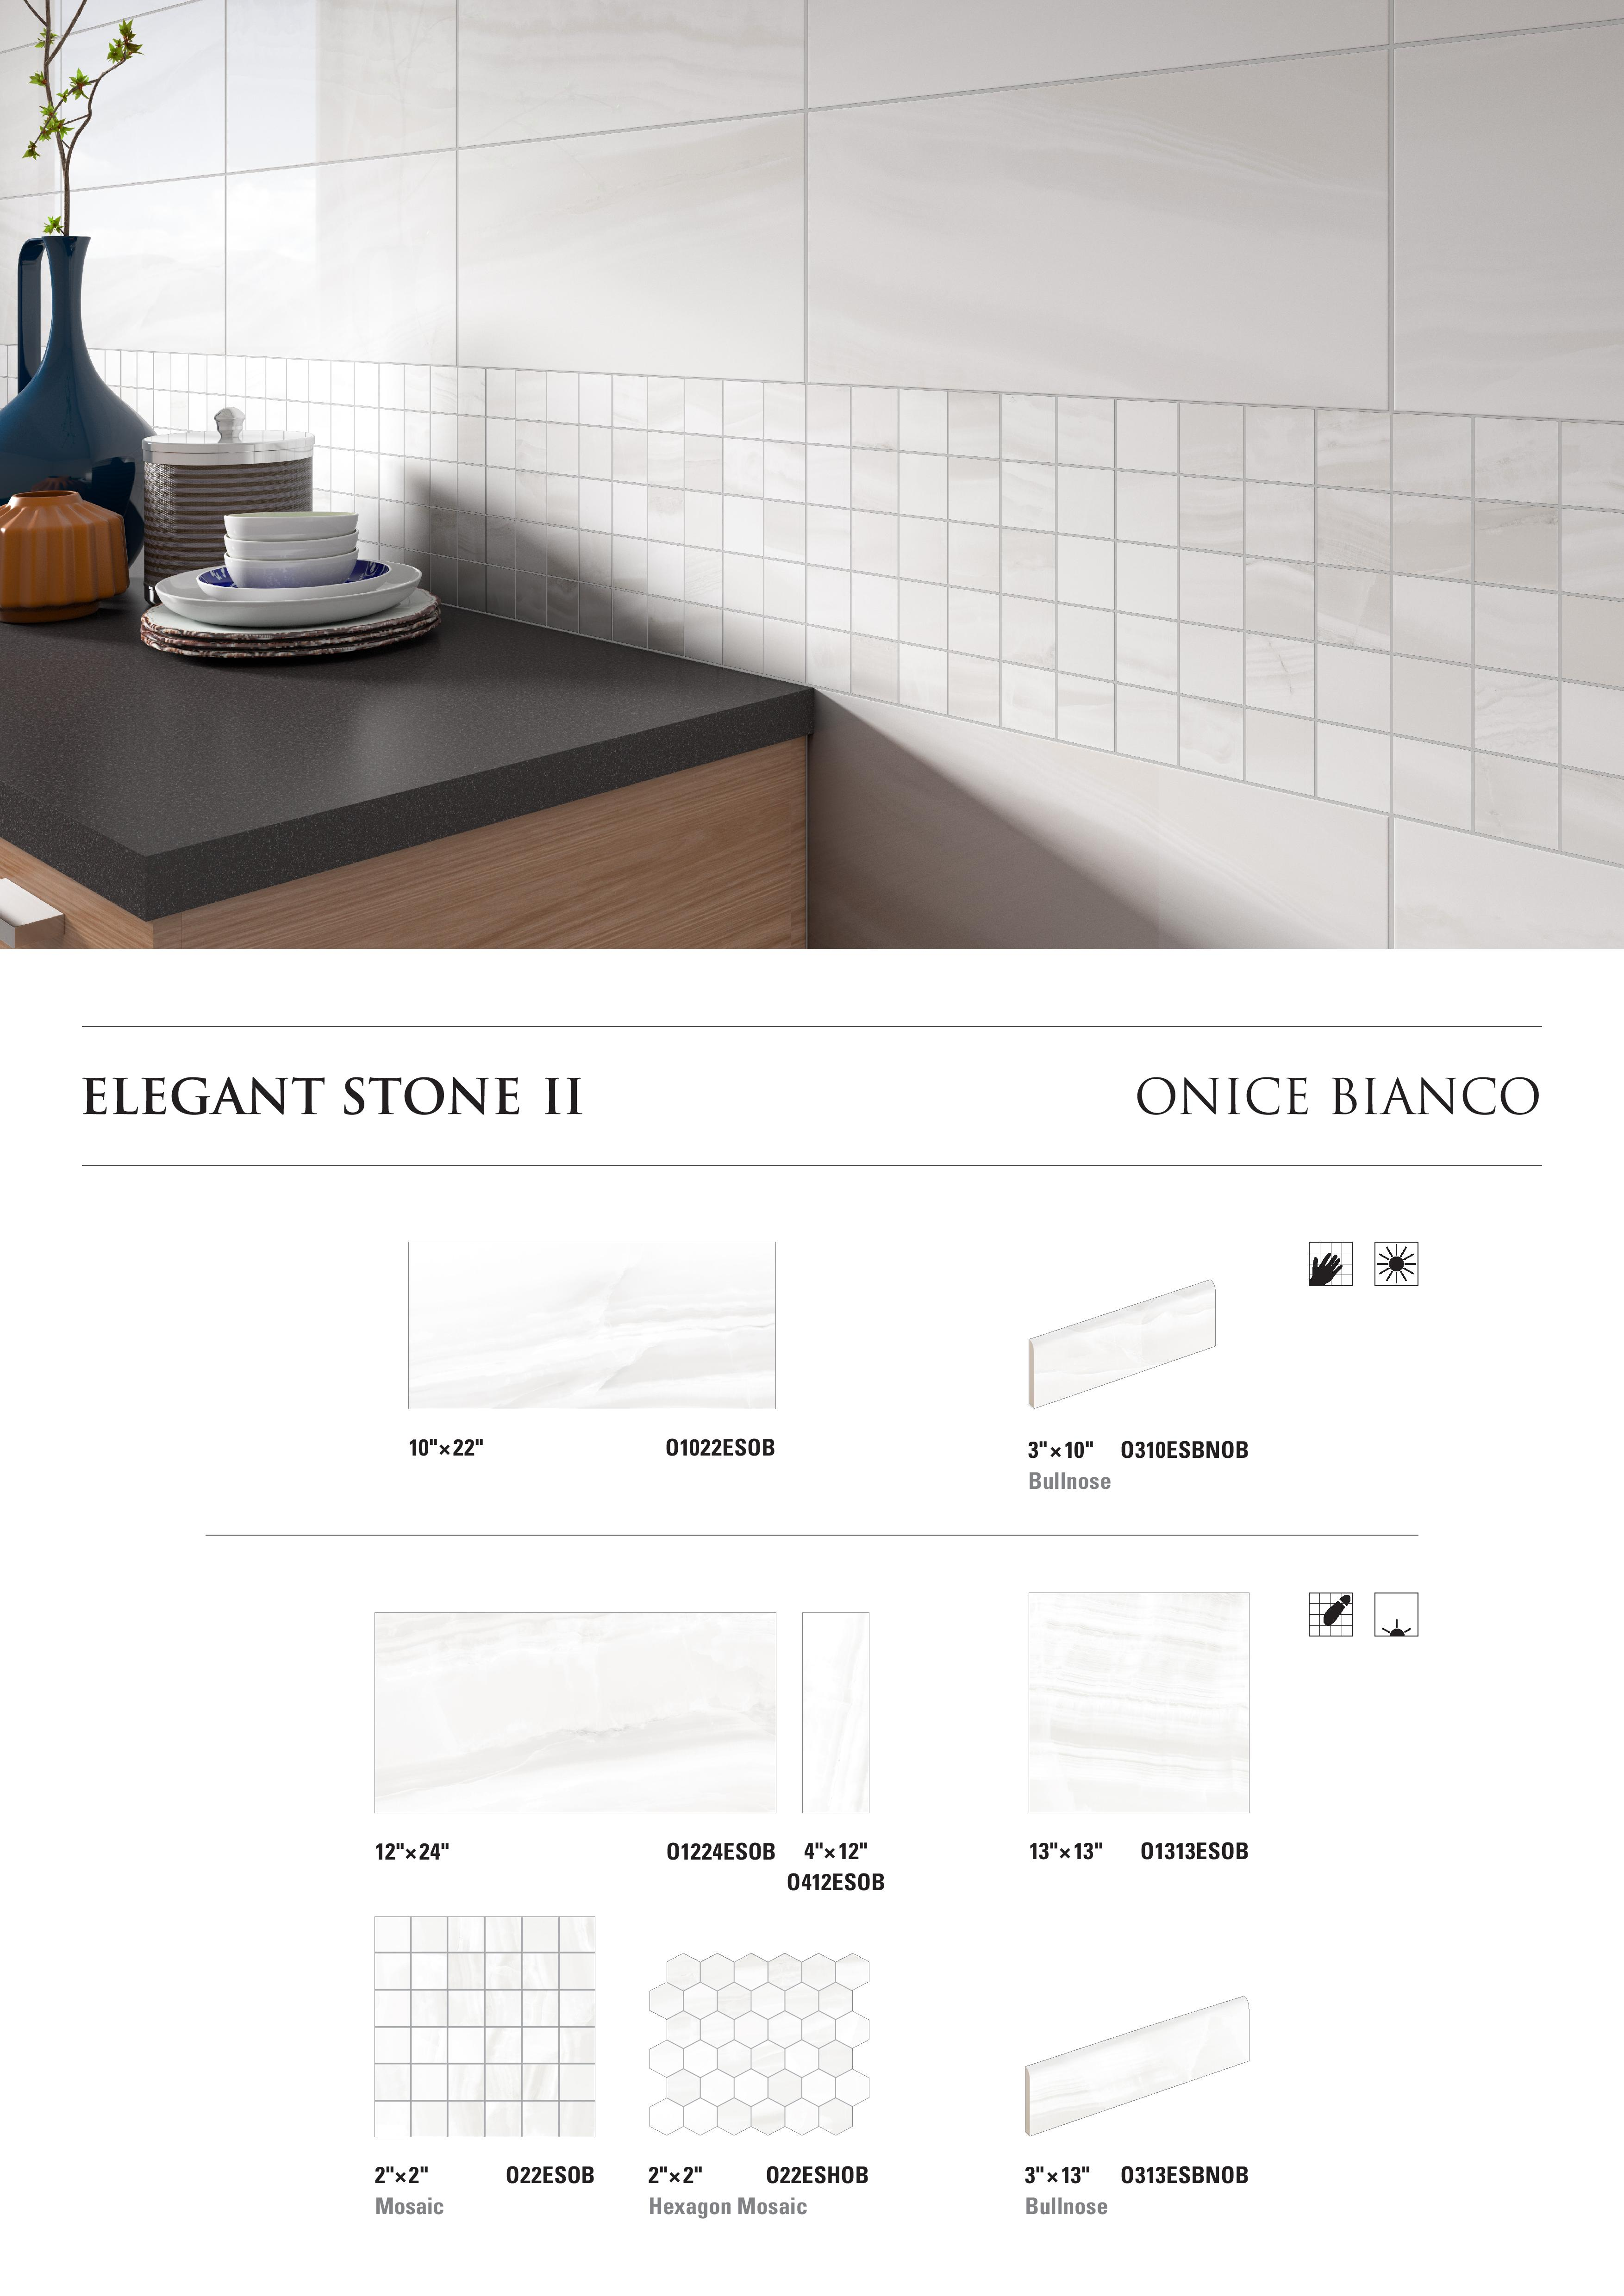 Elegant Stone II Onice Bianco by Opulenza at belktile.com